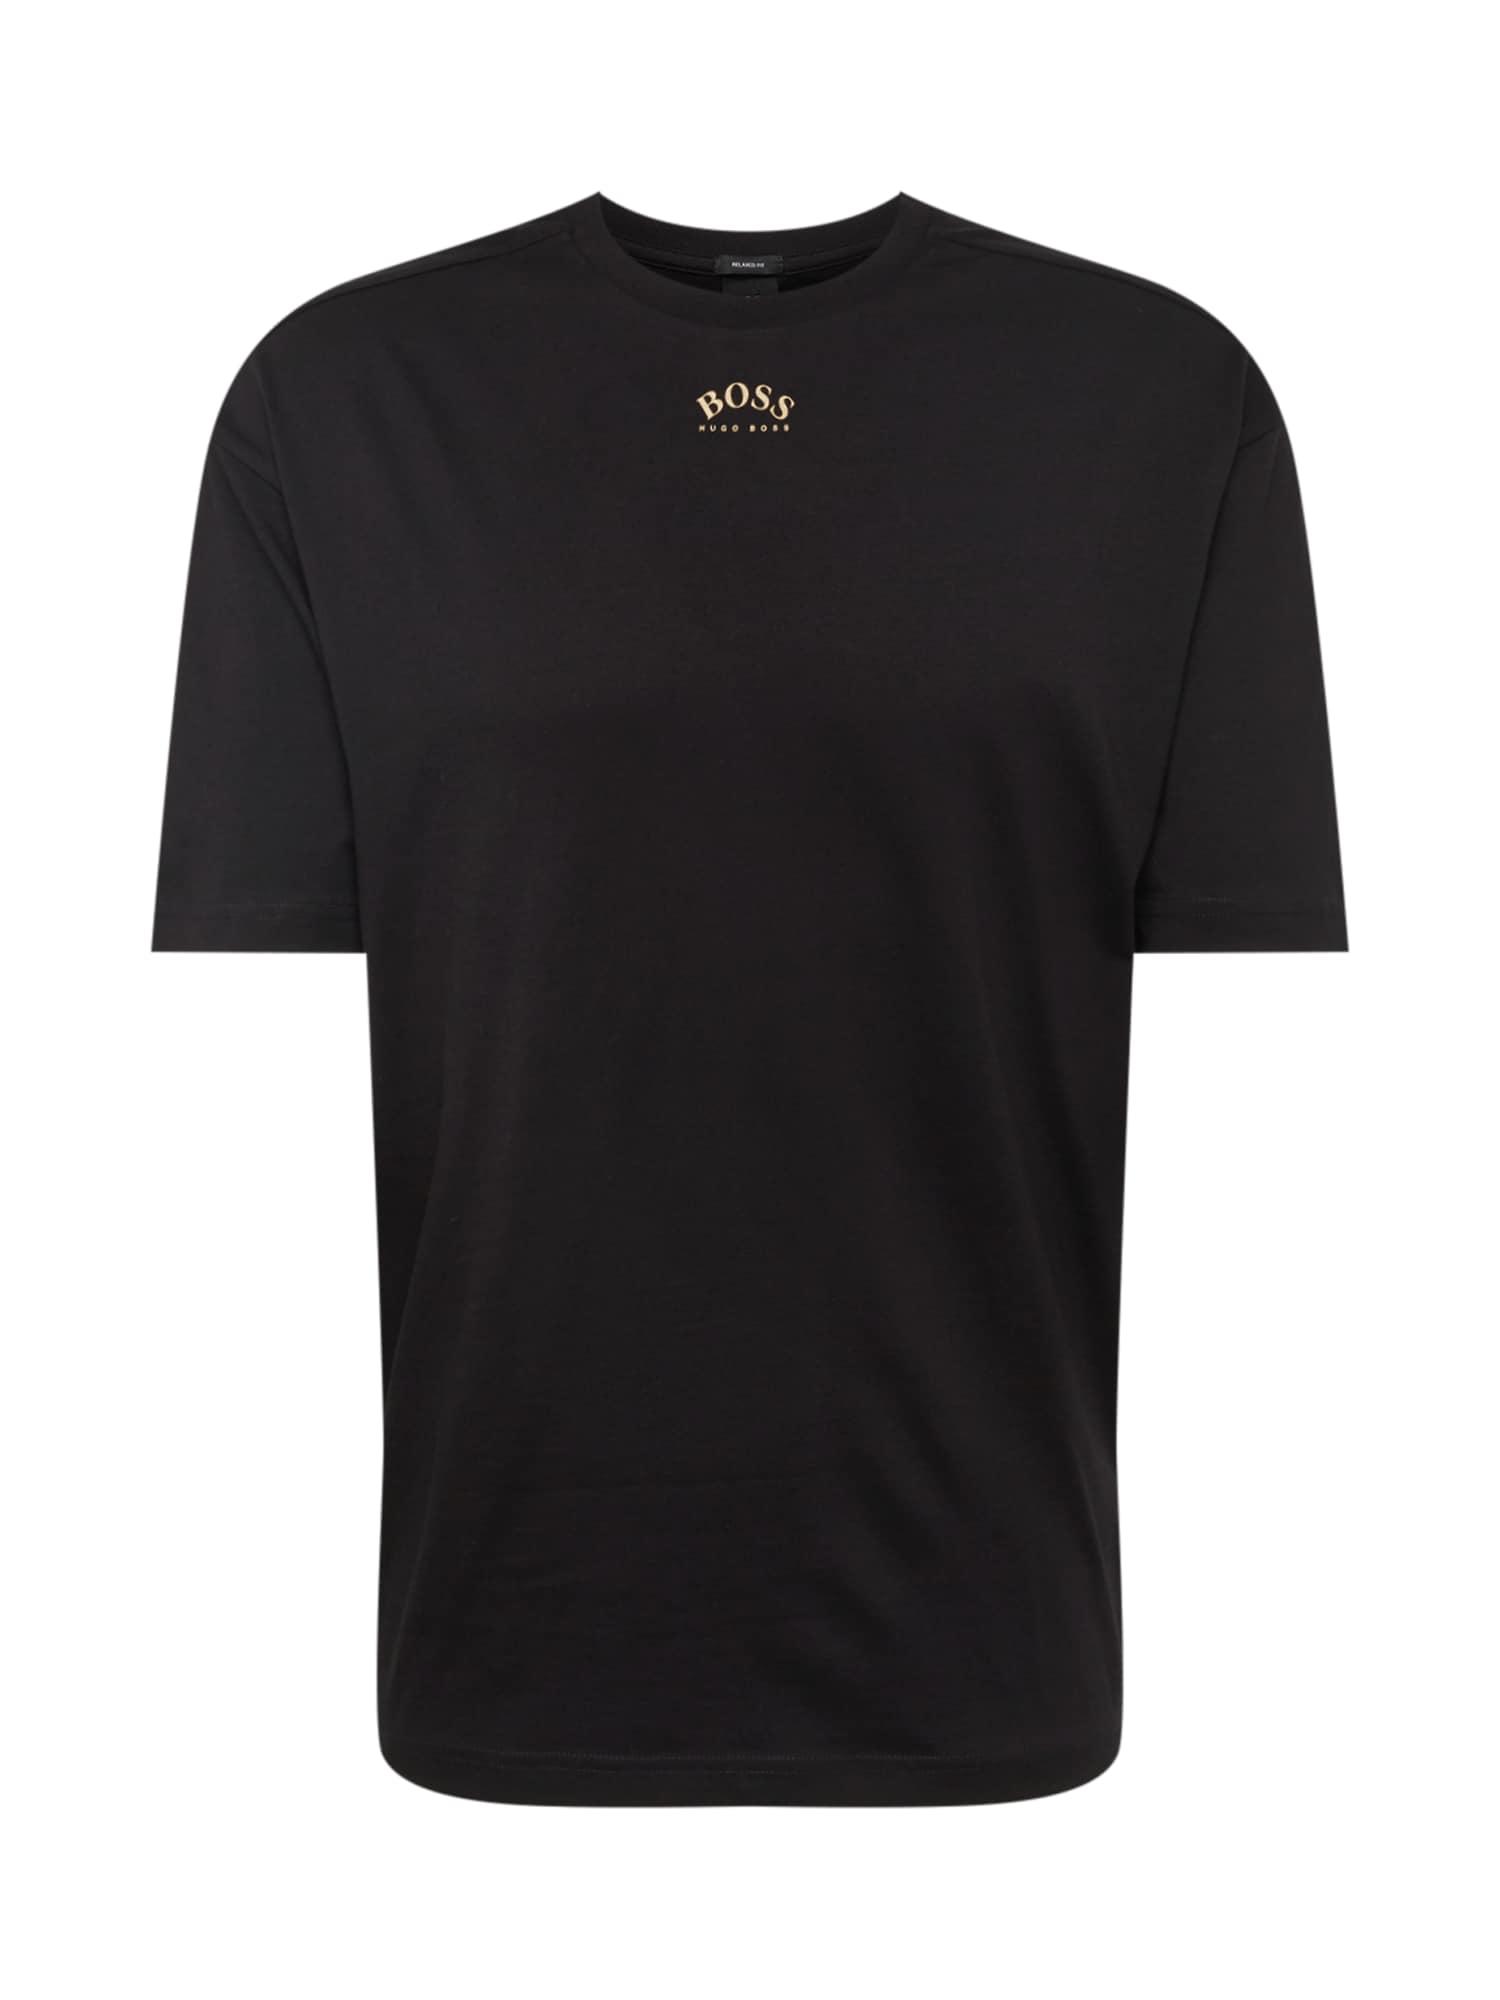 Tričko Talboa černá BOSS